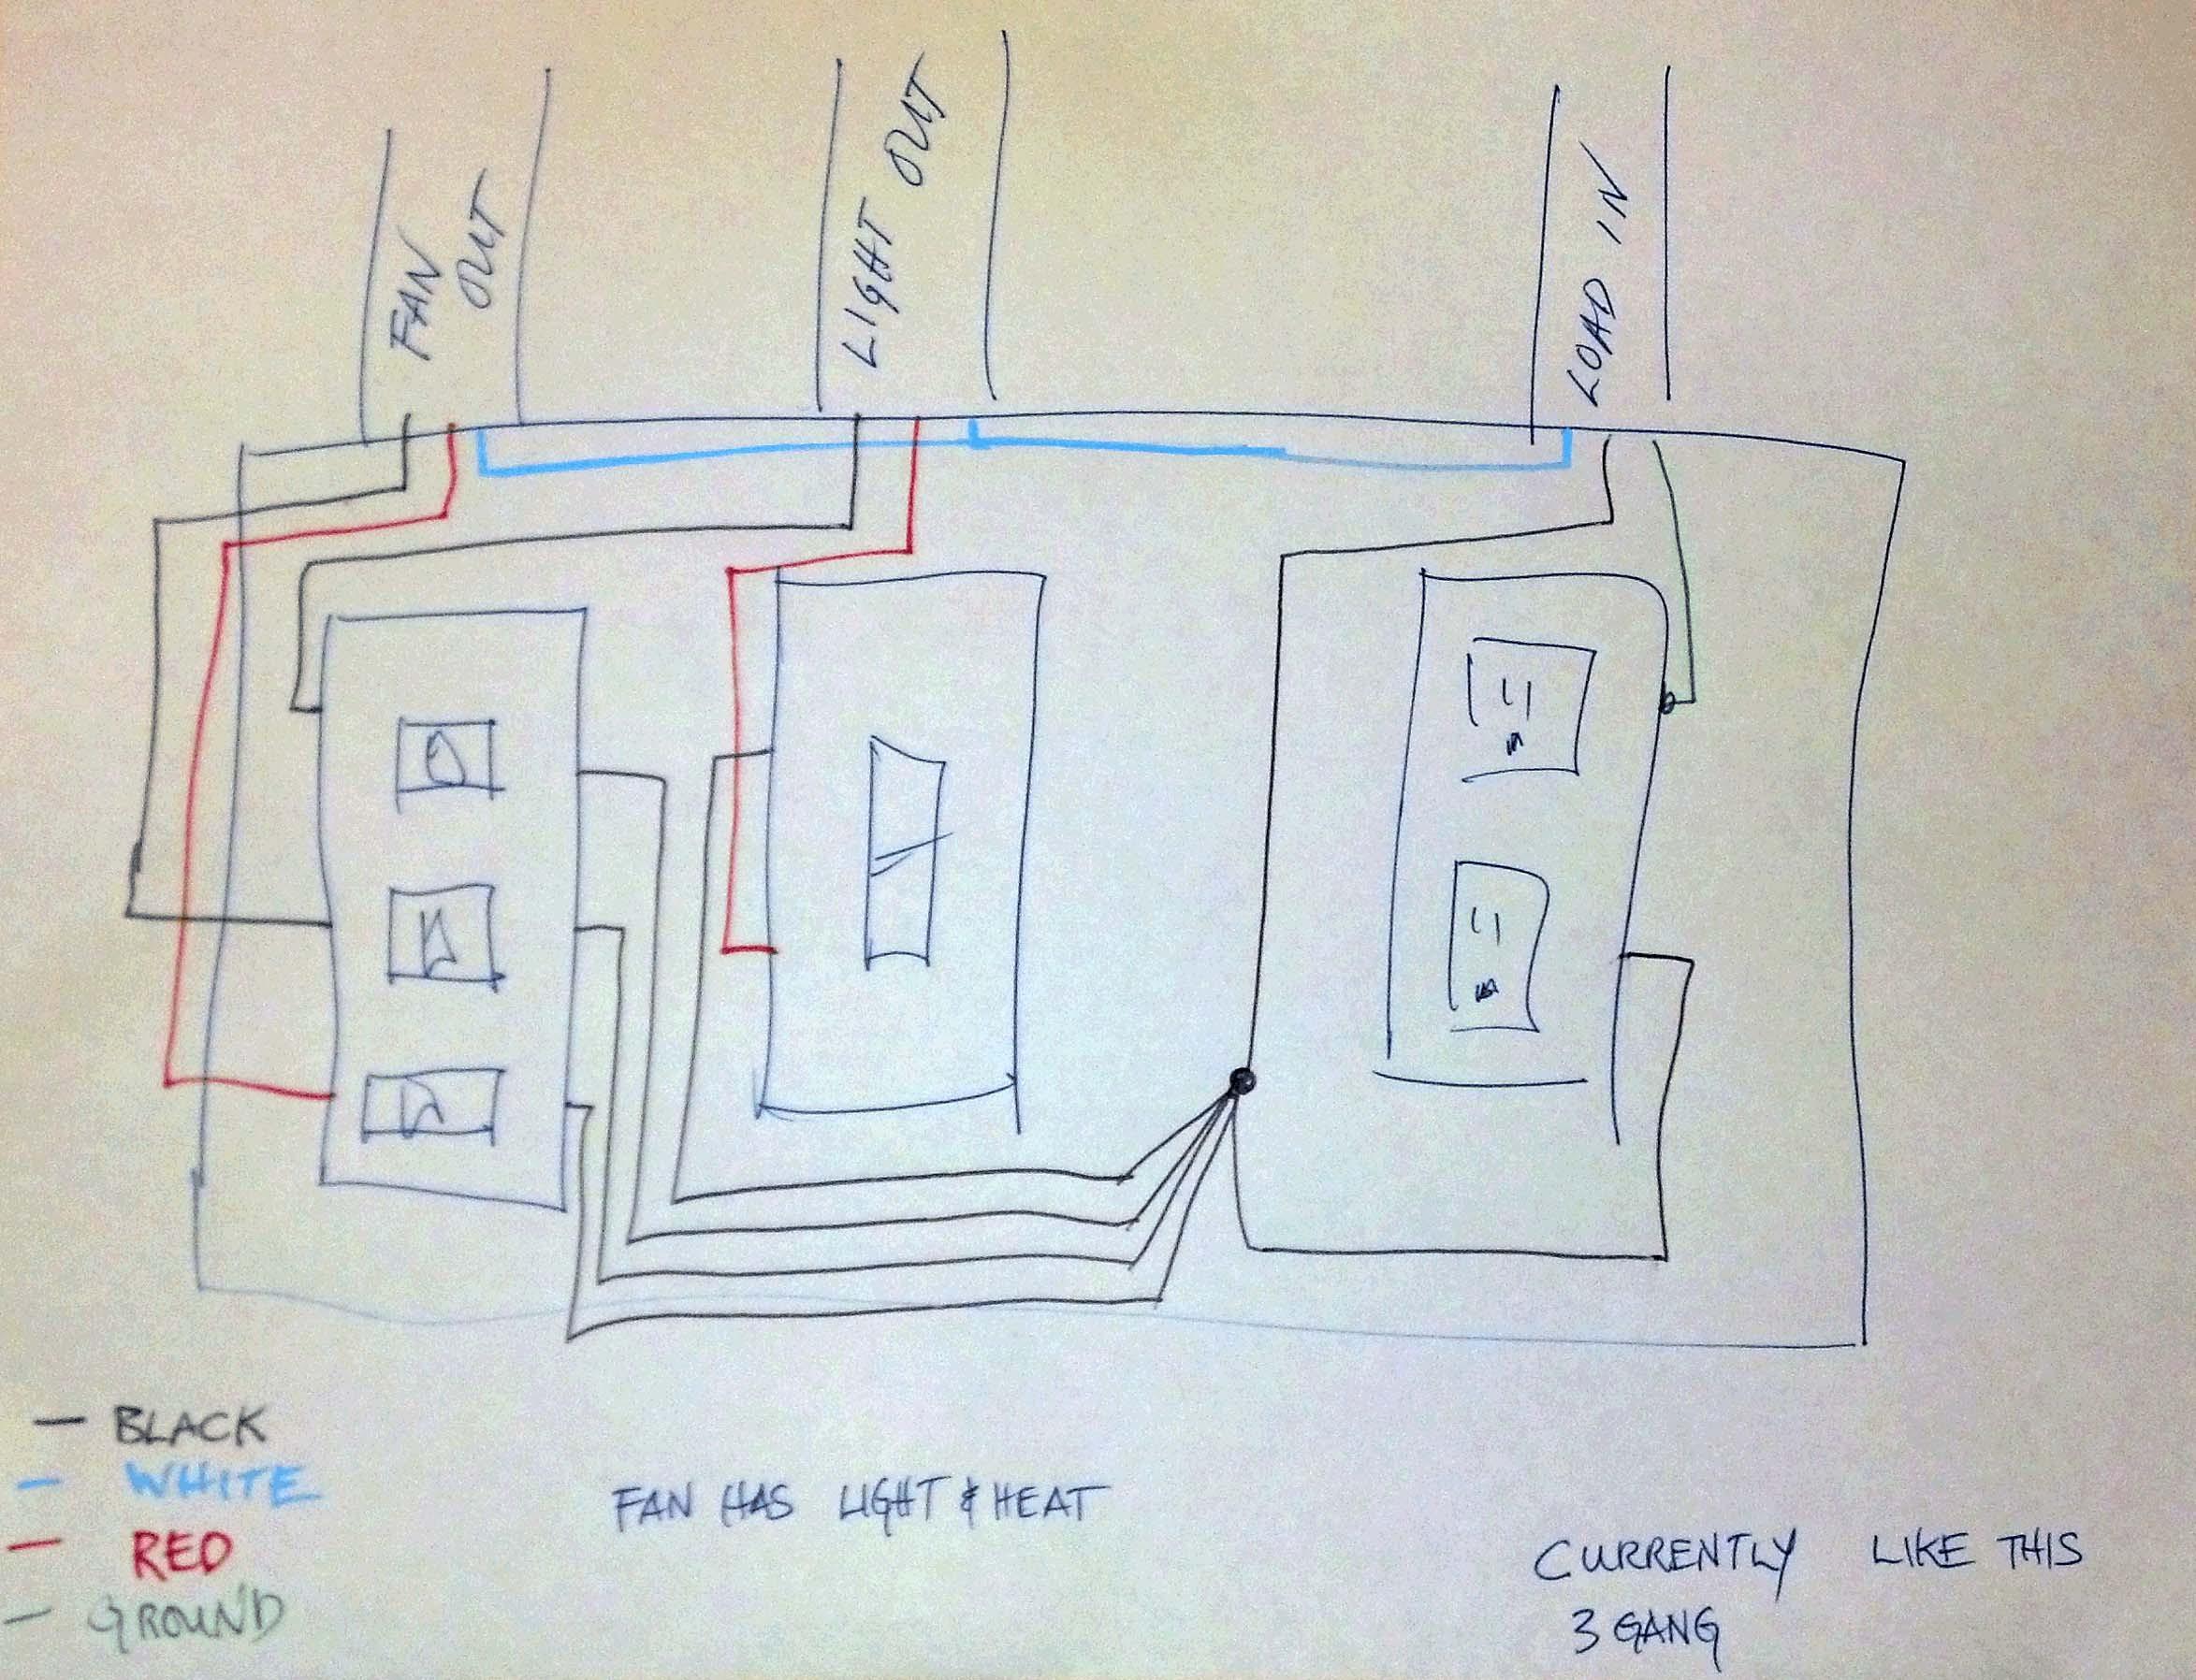 bathroom light and fan wiring diagramml